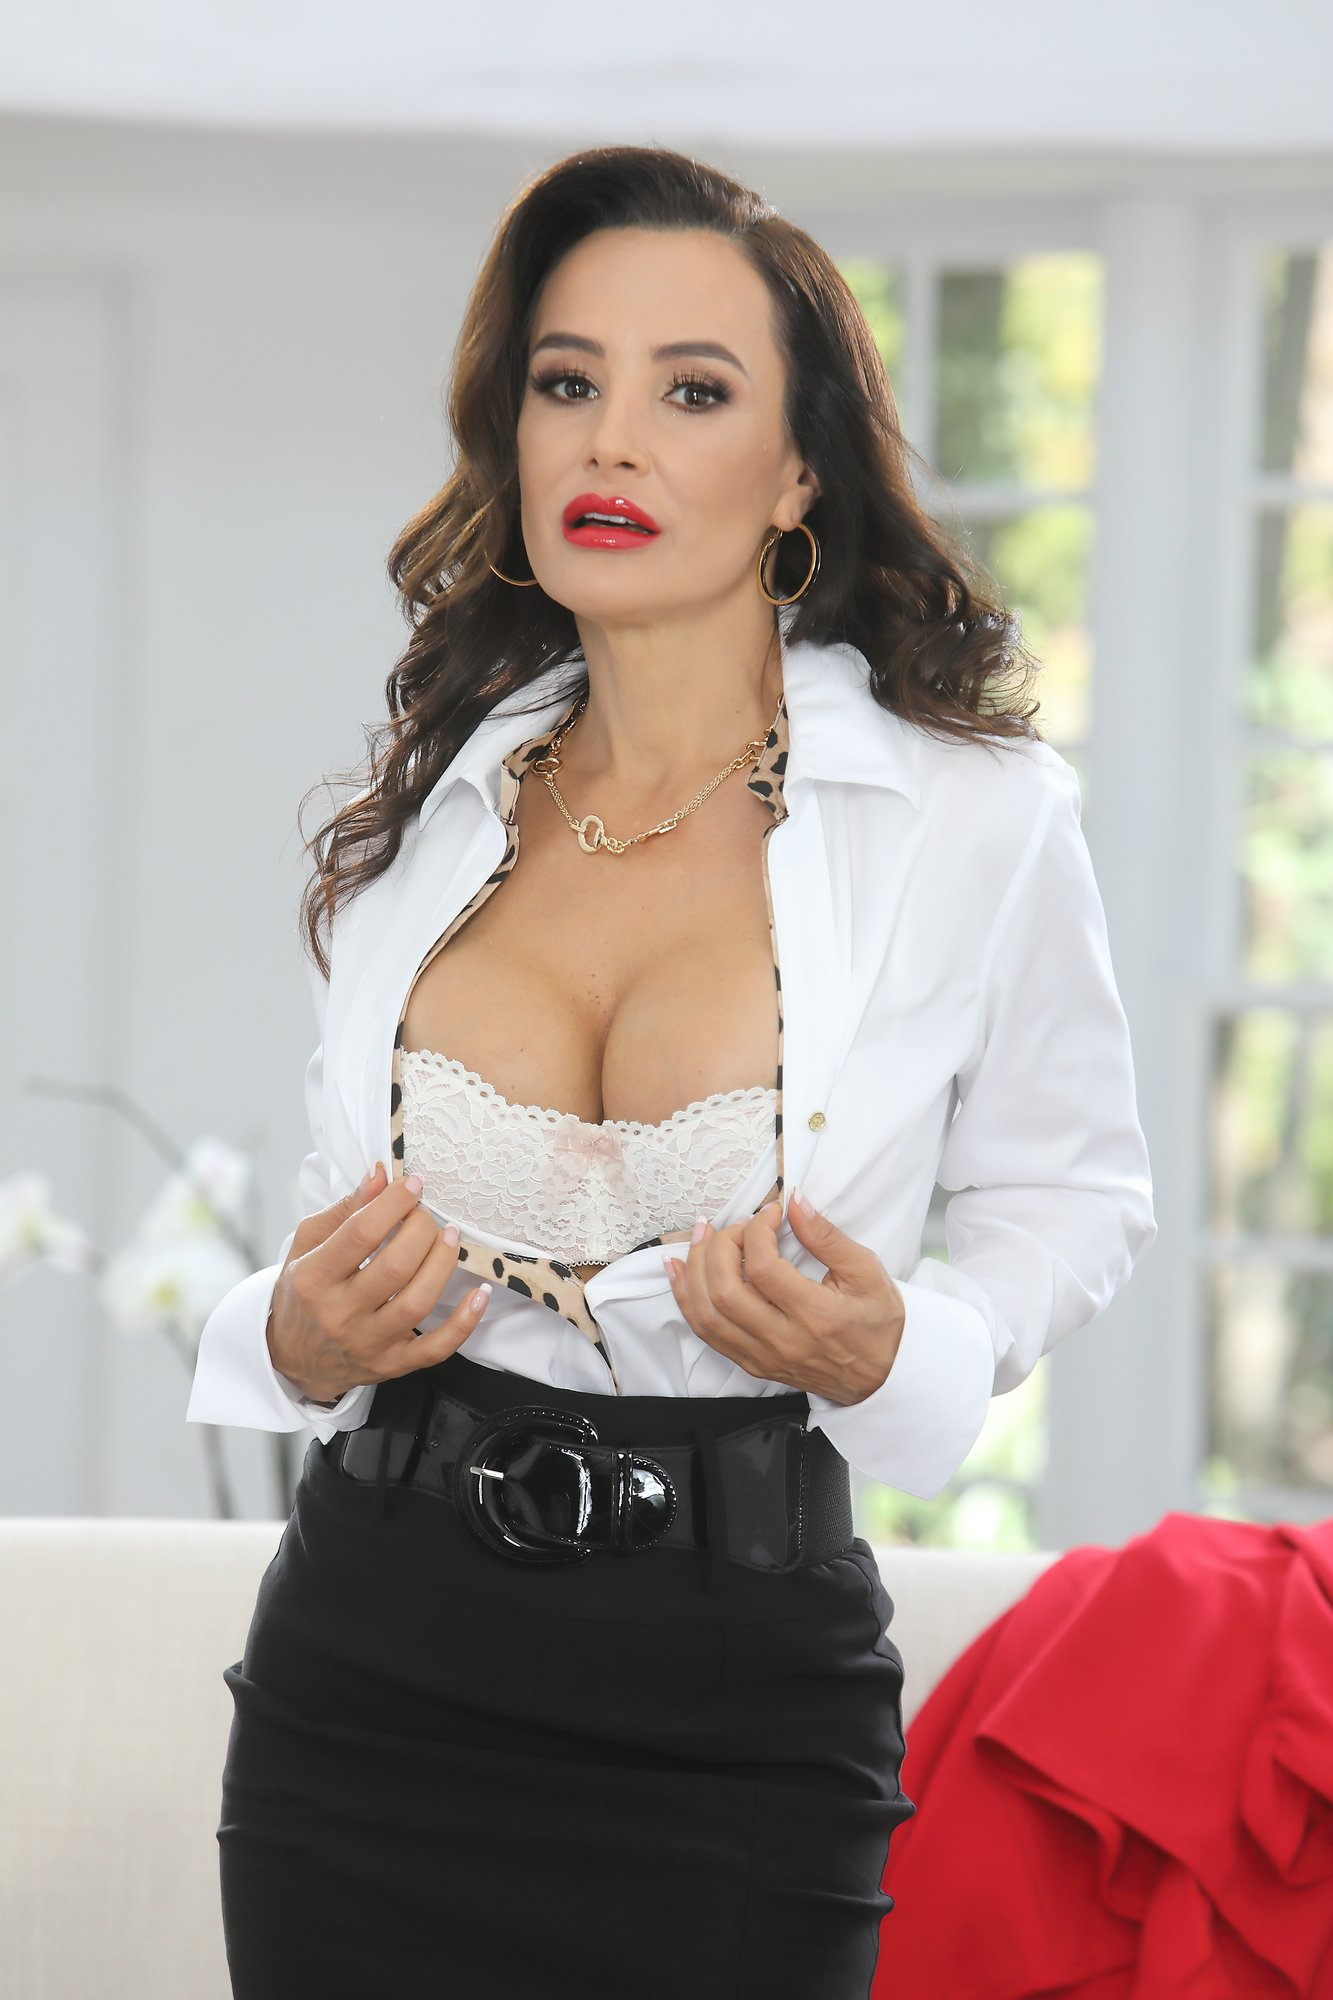 lisa ann body sex